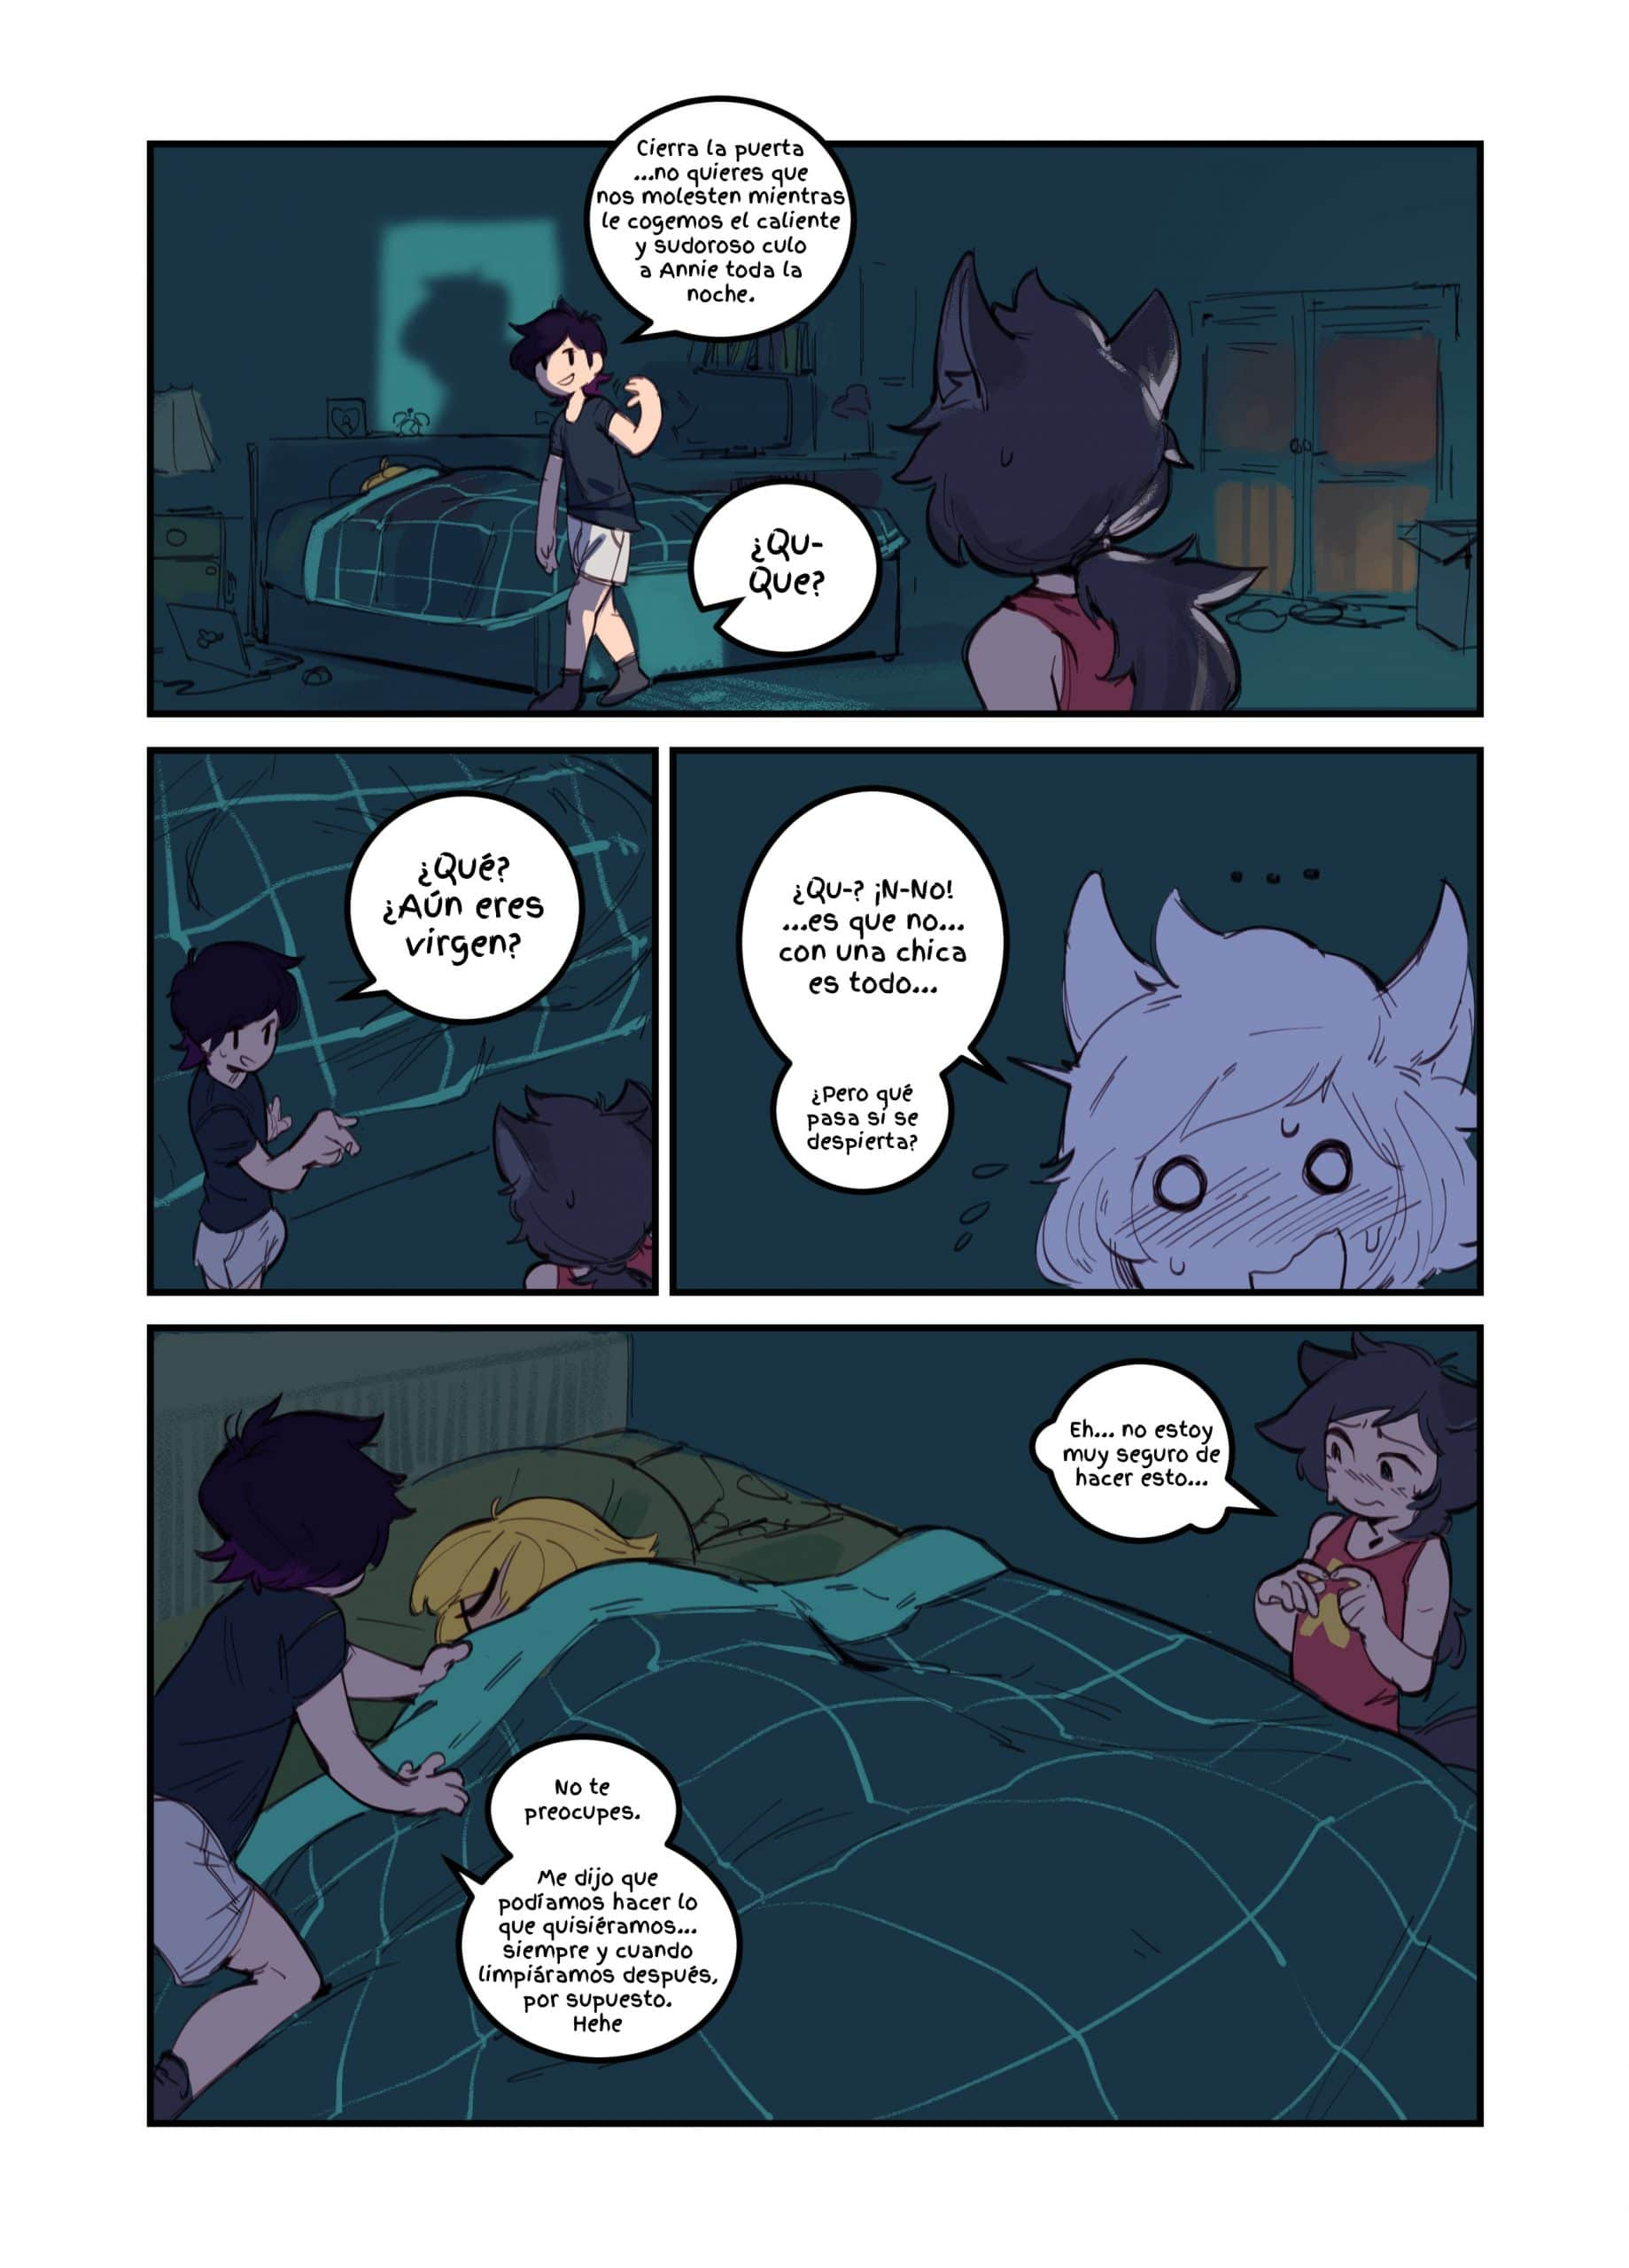 [GREASYMETA] – ANNIE'S SUPER DUPER X2 SLEEP-OVER - 3